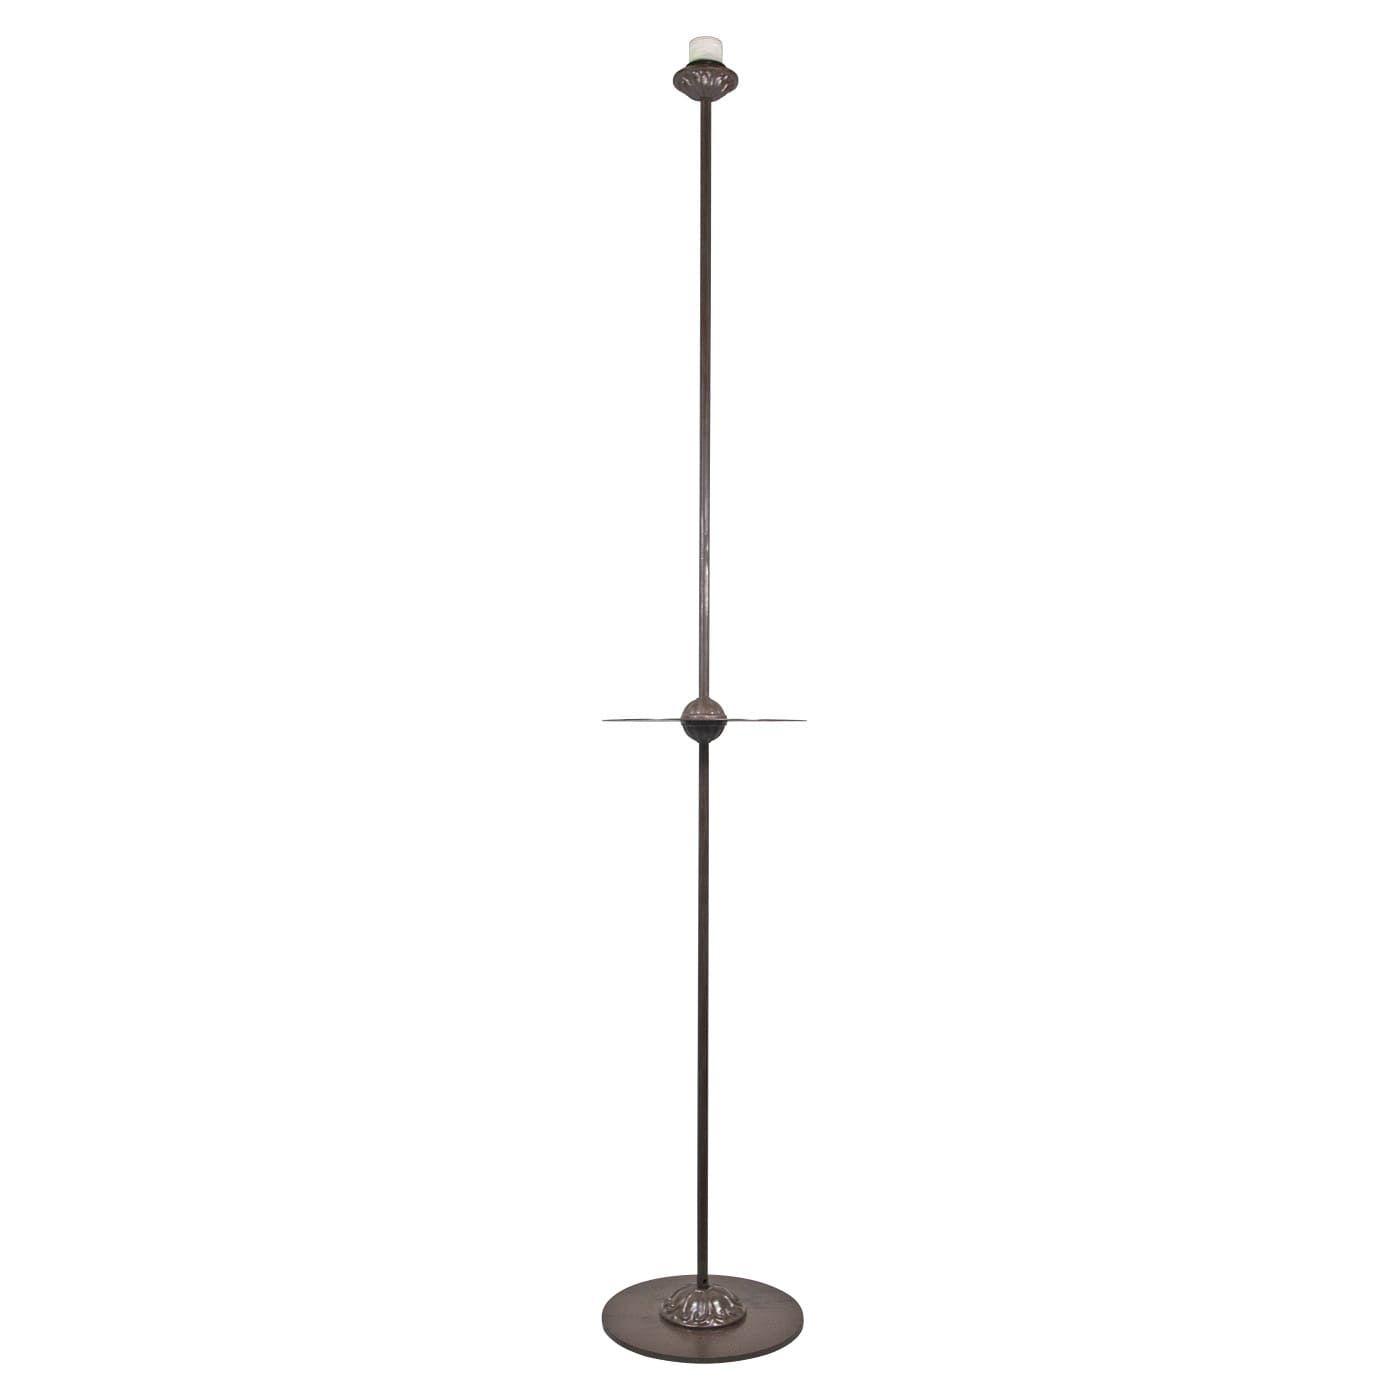 PETRASVET / Floor lamp S5065-1, 1xE27 max. 60W